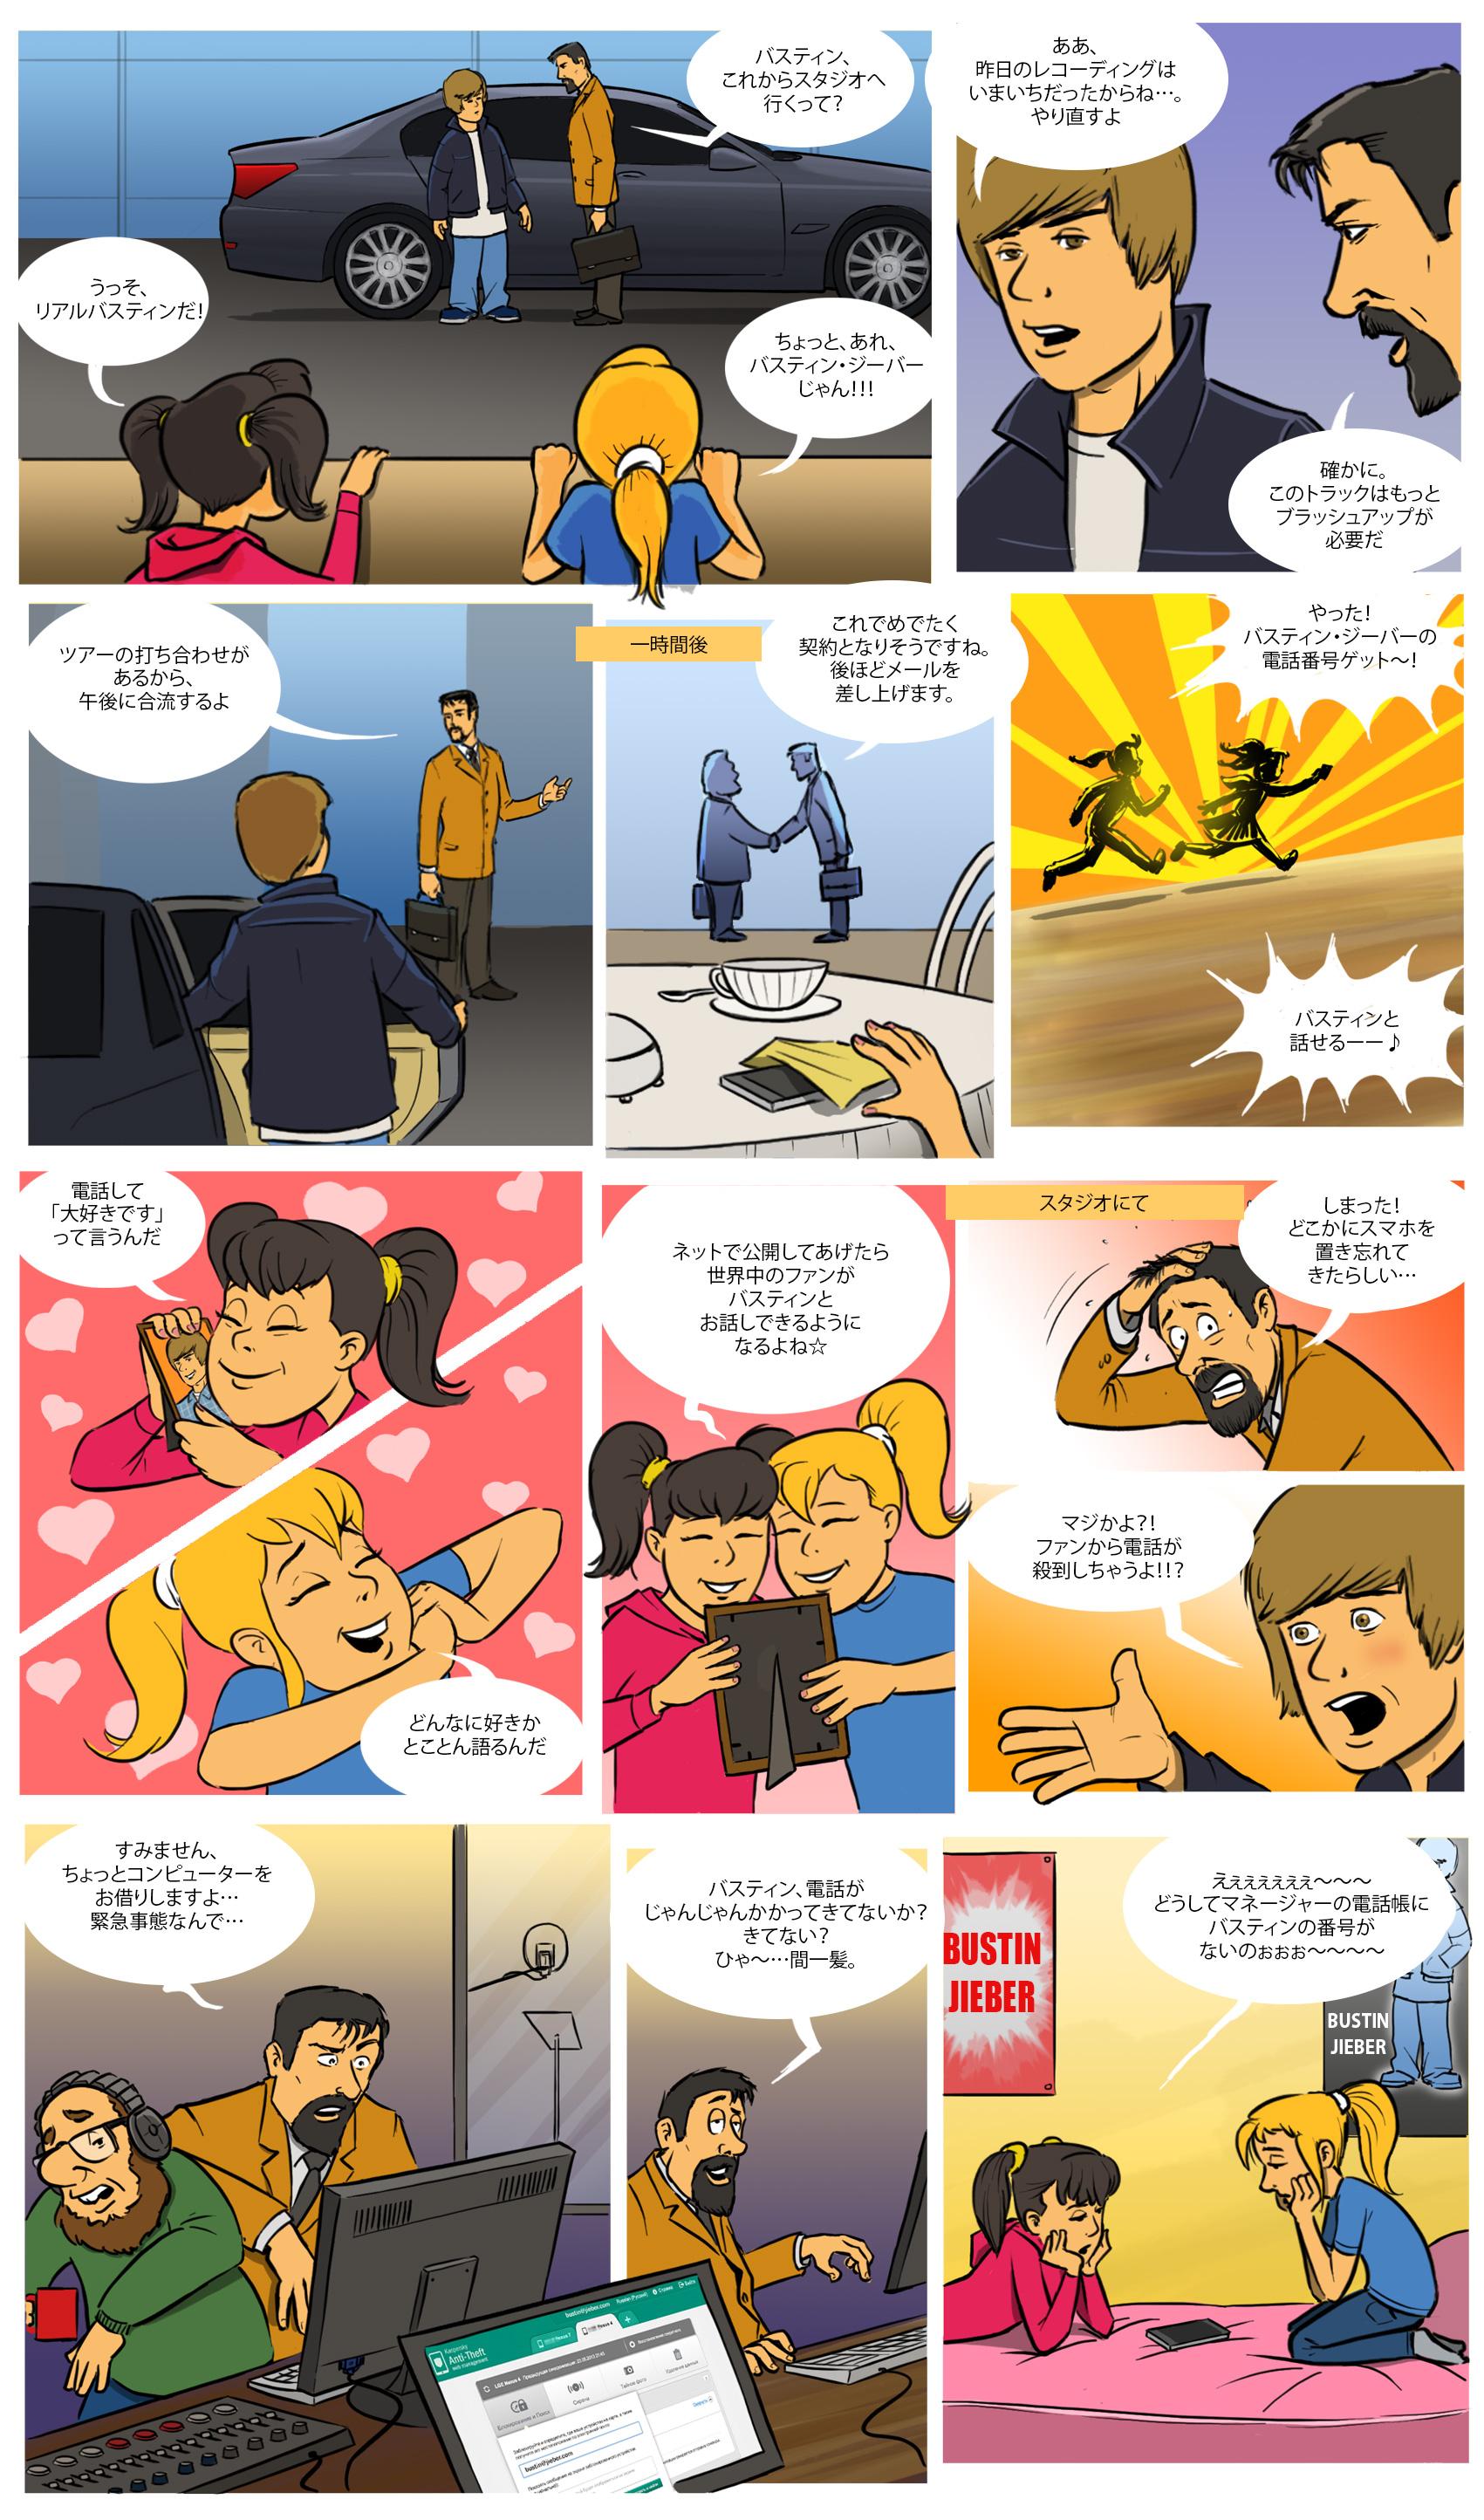 kisaヒント:コミック-保護する連絡先